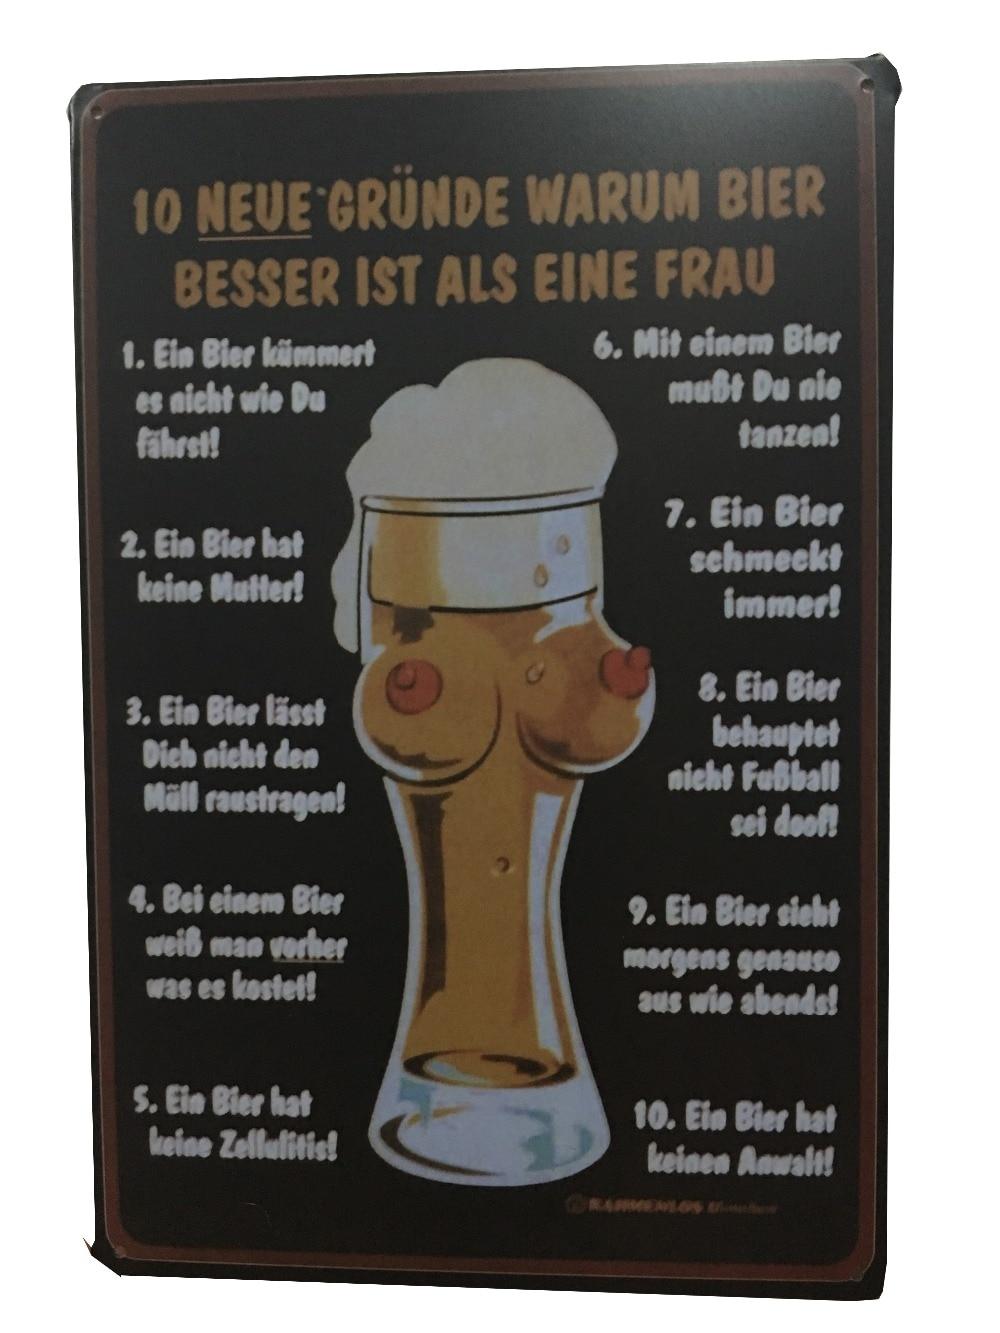 Half naked man beer poster